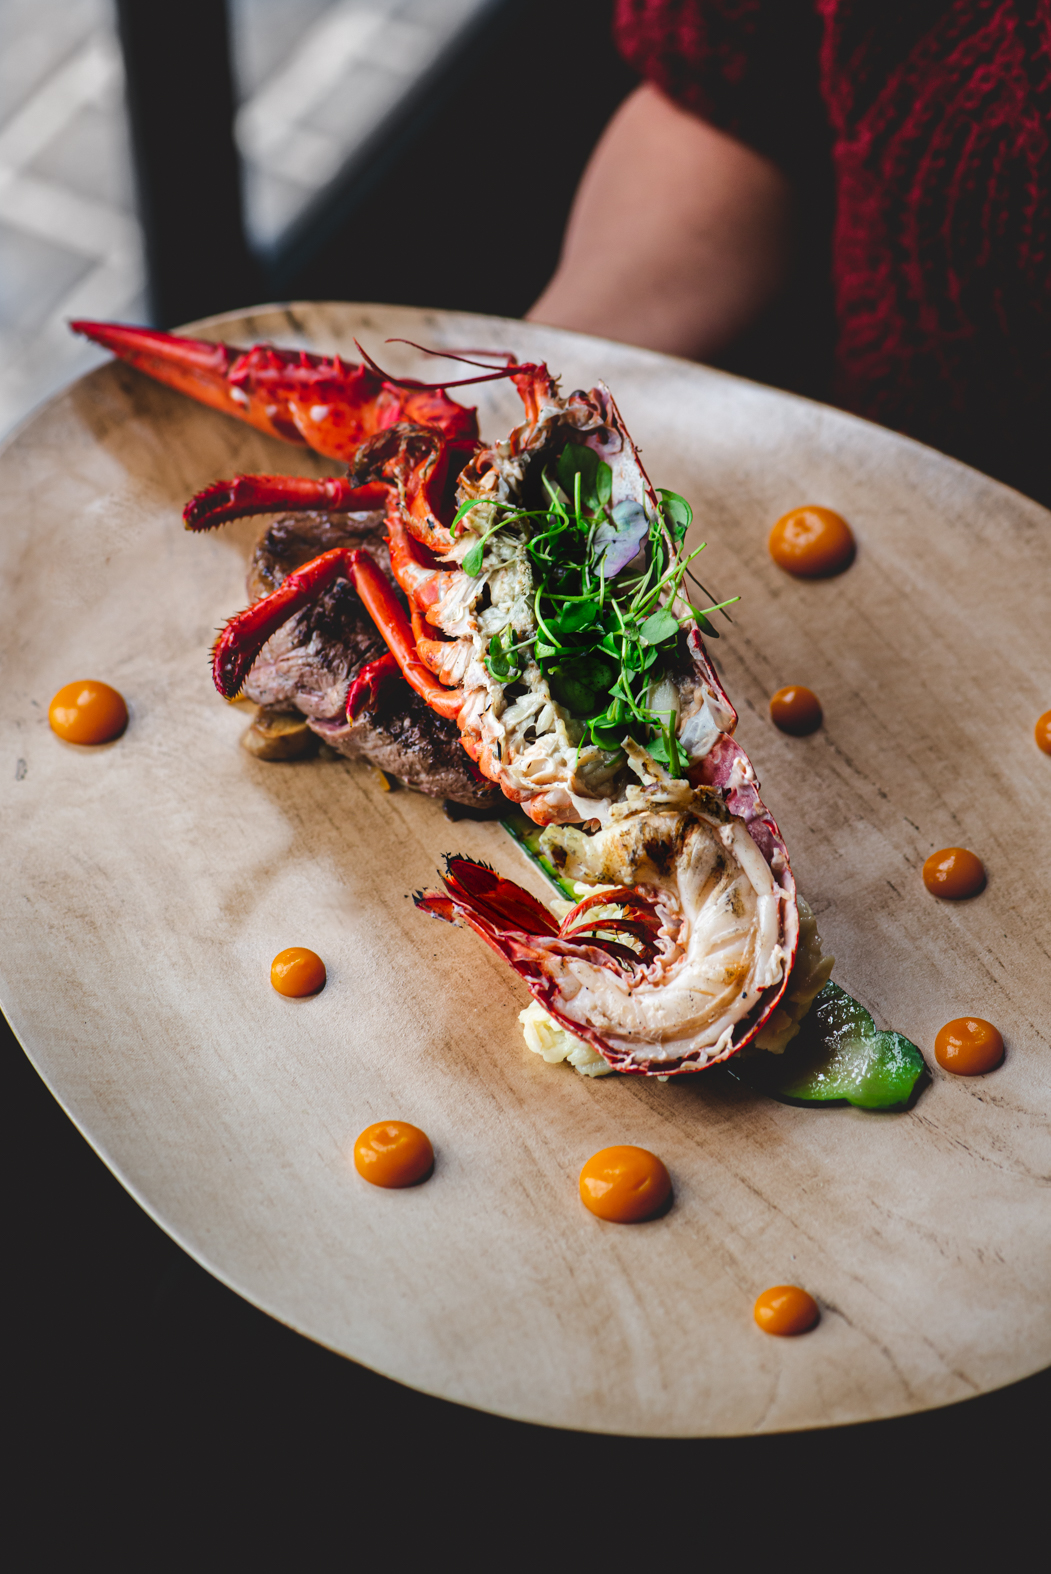 Kreeft Bistro de Kruidentuin - Stefanie Spoelder roodfotografie - Food Photography